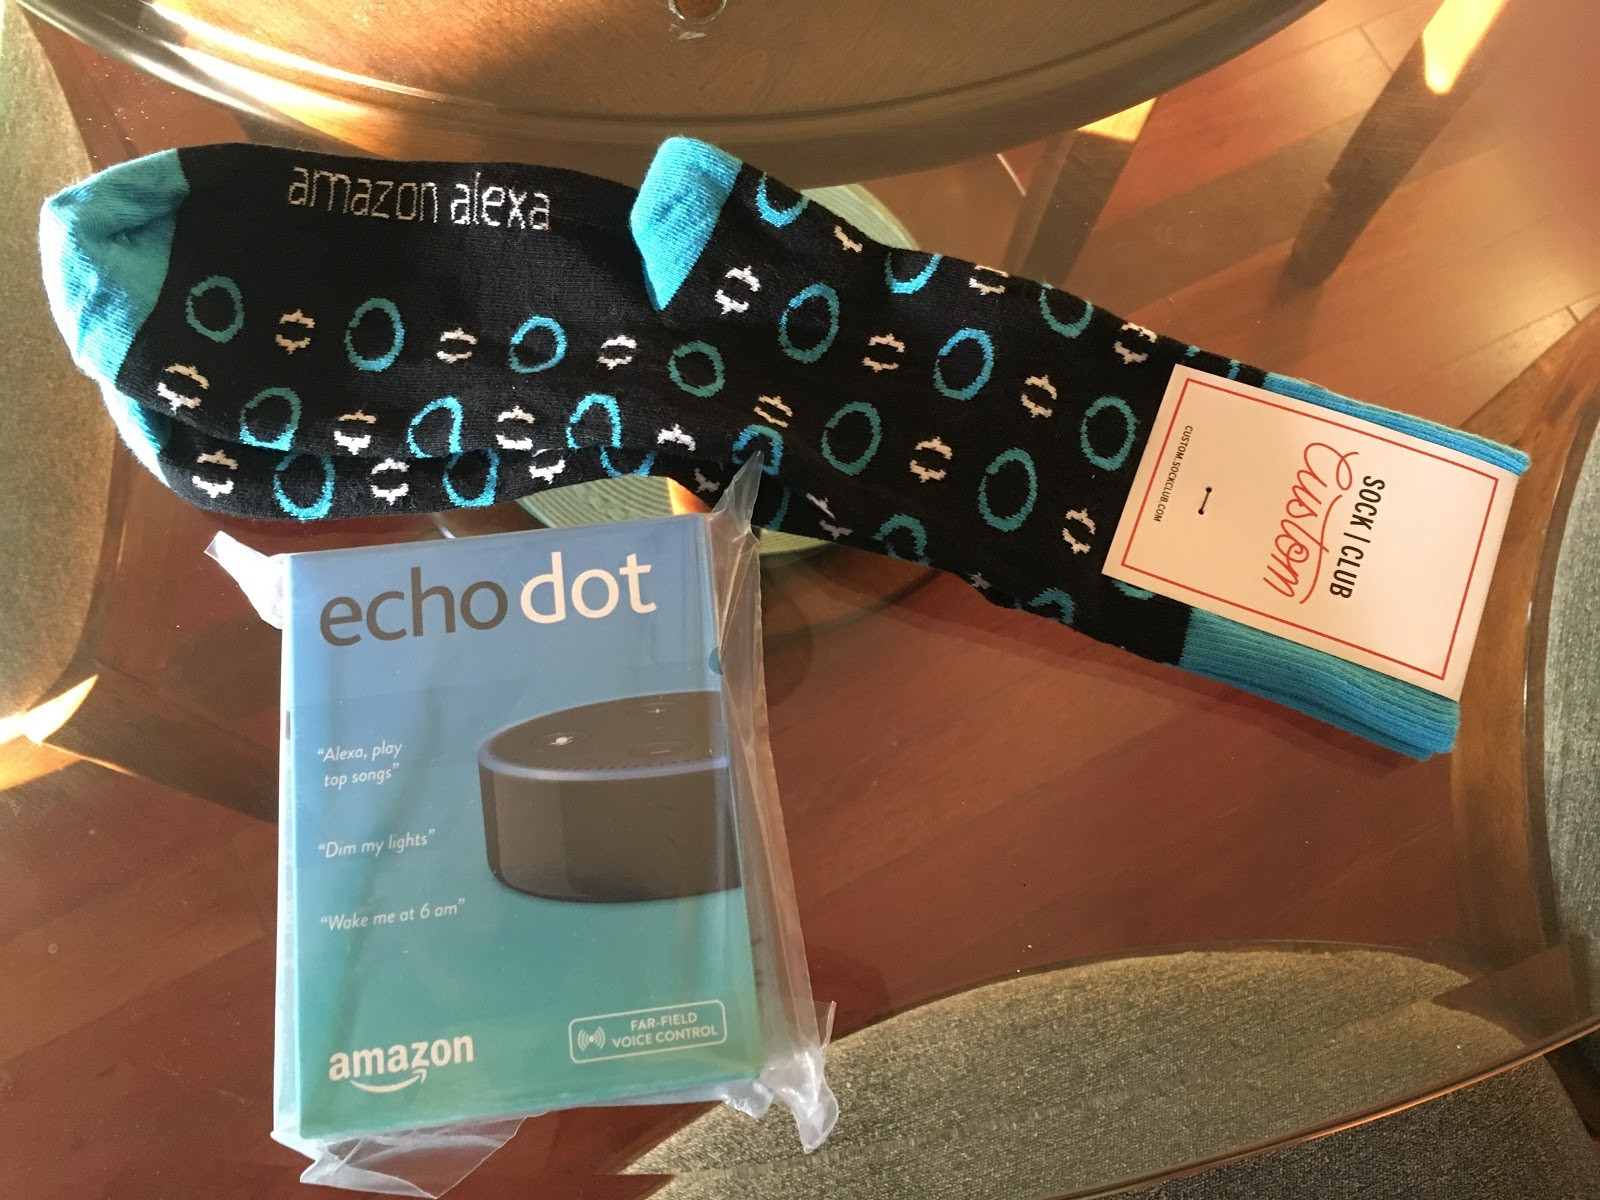 How was I funneled into Alexa Development? By radhesh gupta